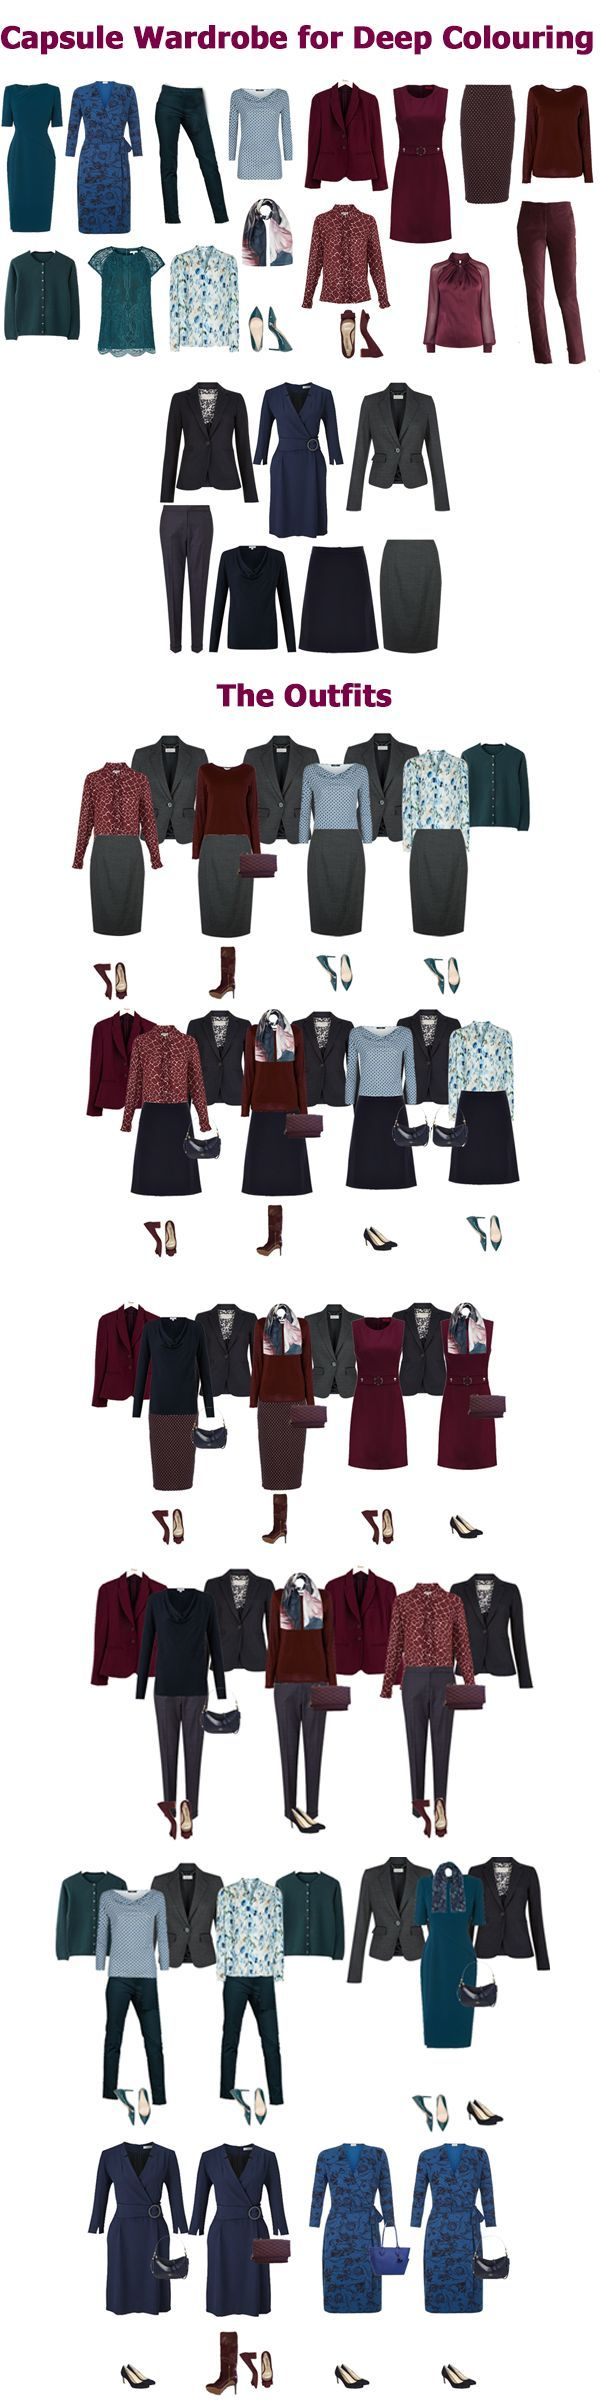 Autumn business wear capsule wardrobe example